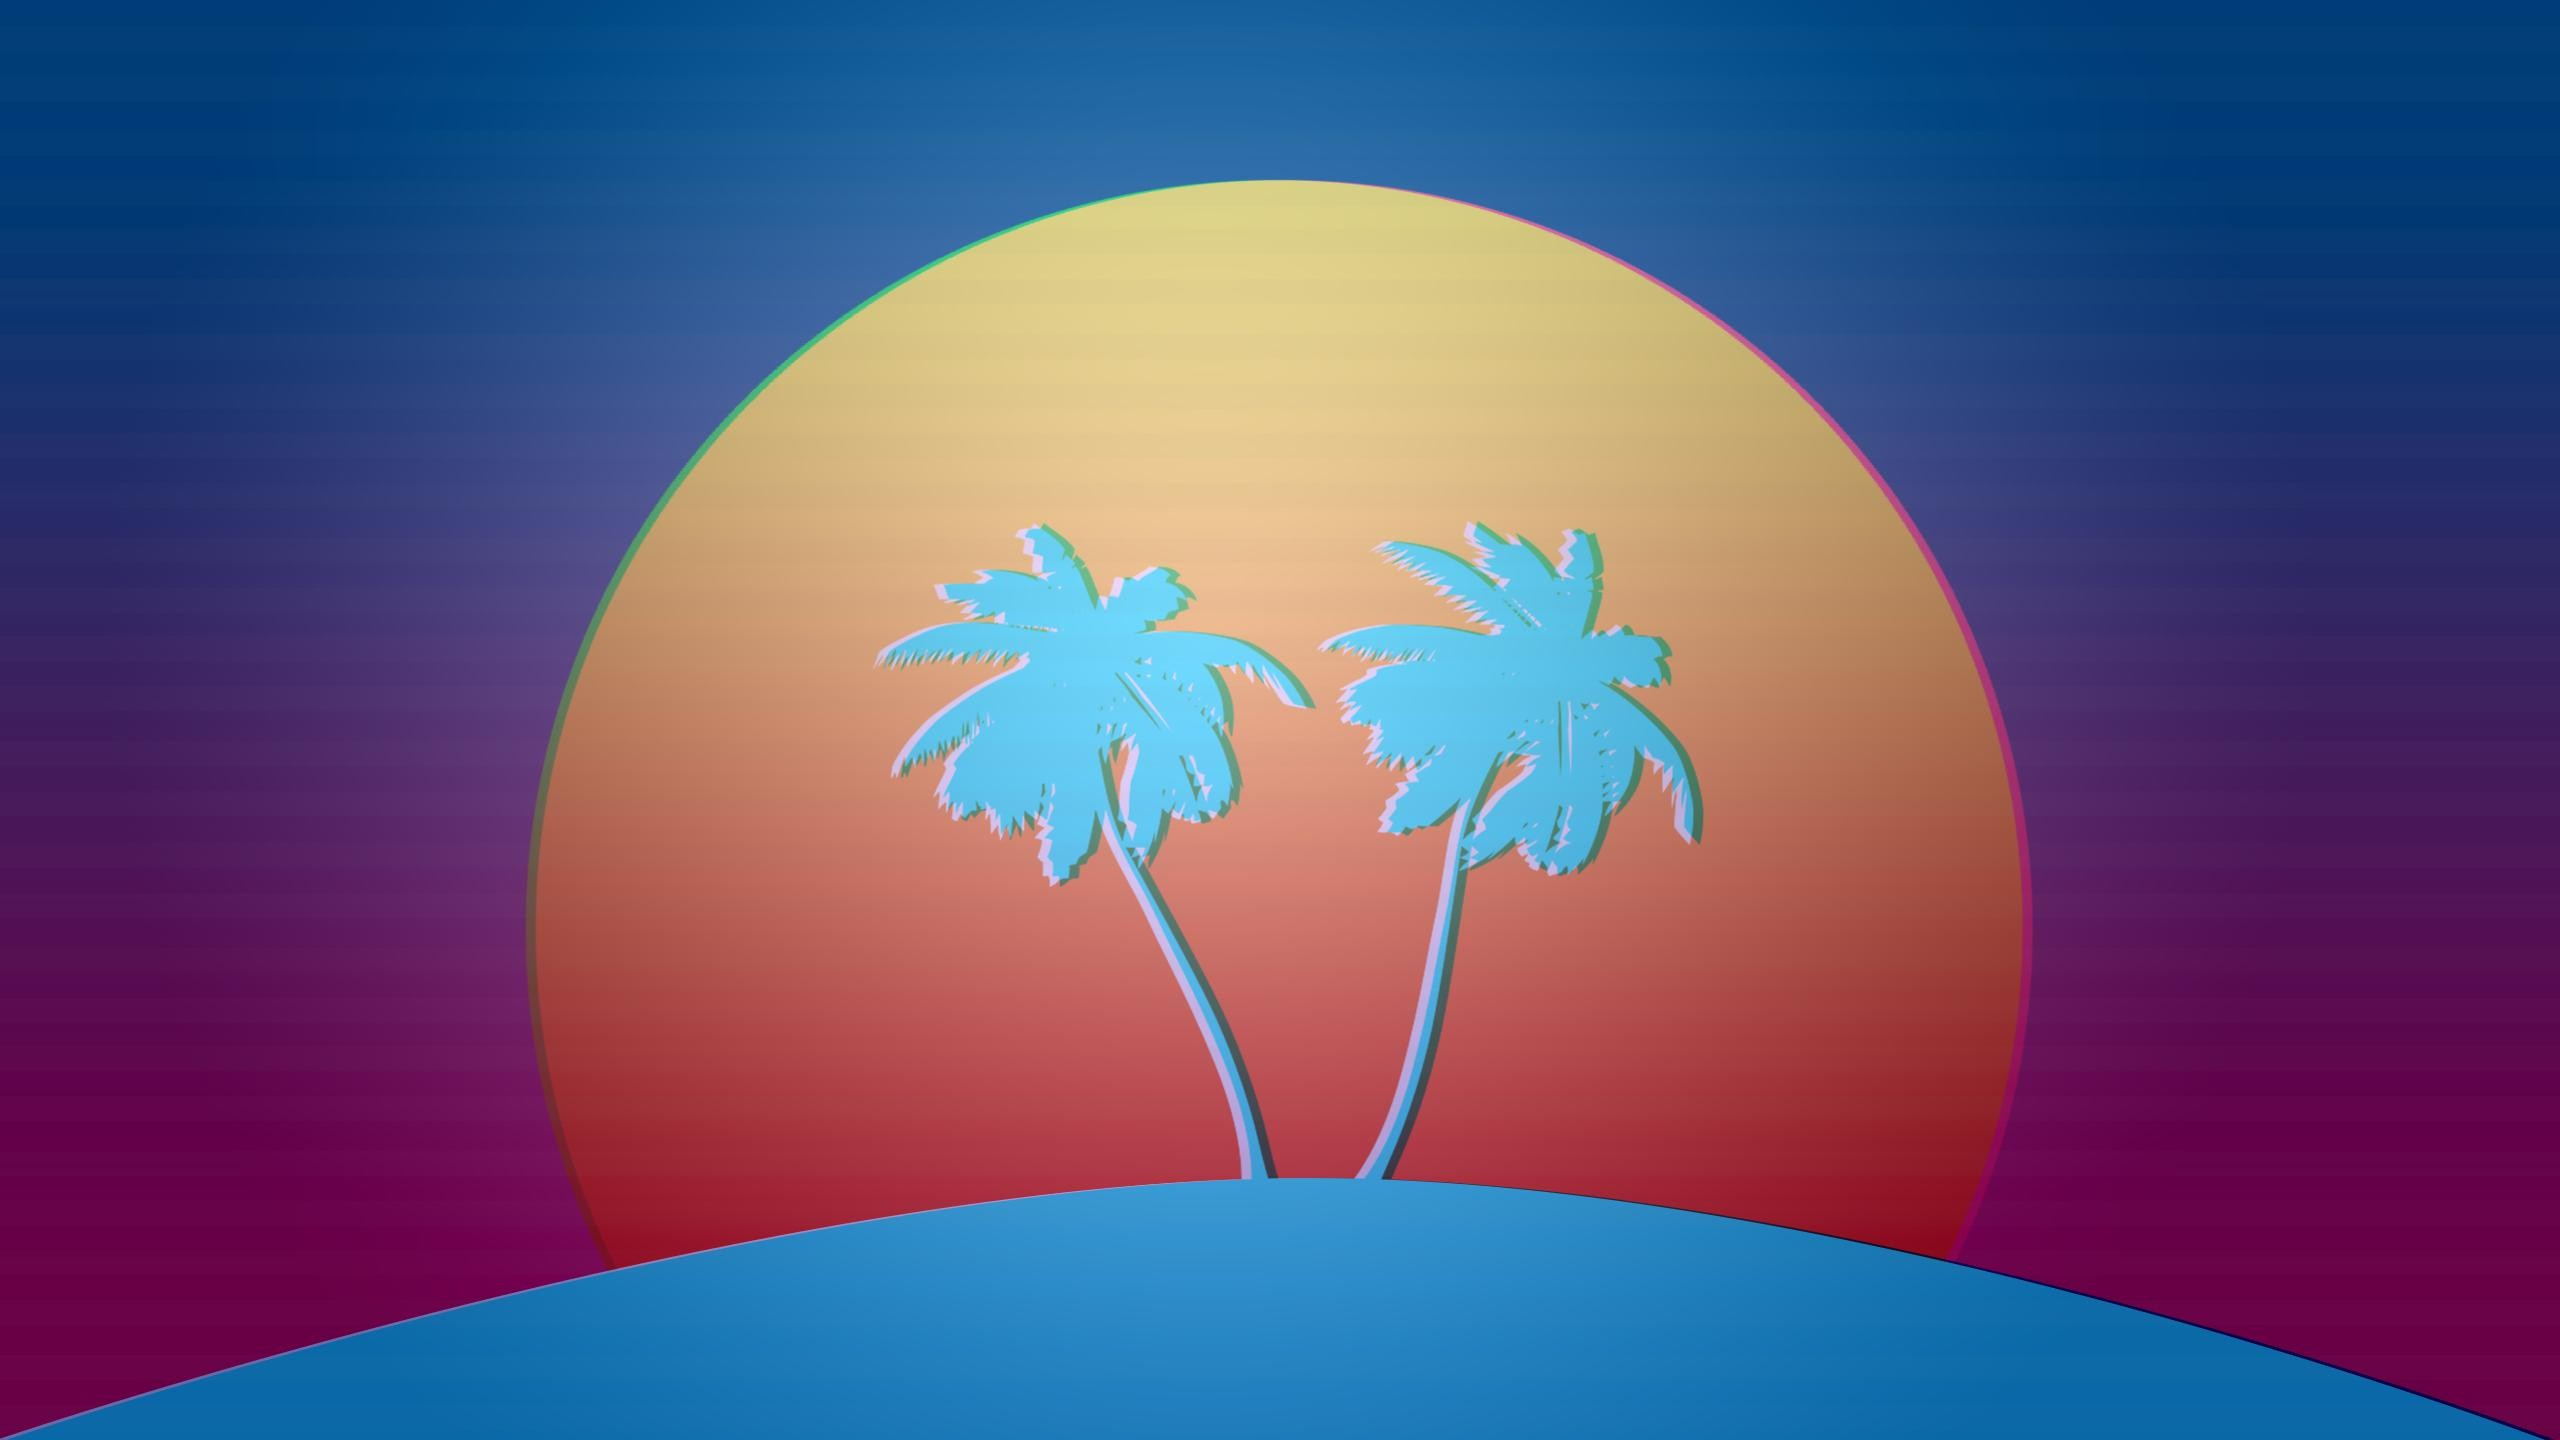 Hotline Miami Wallpaper Download Free Amazing Full Hd